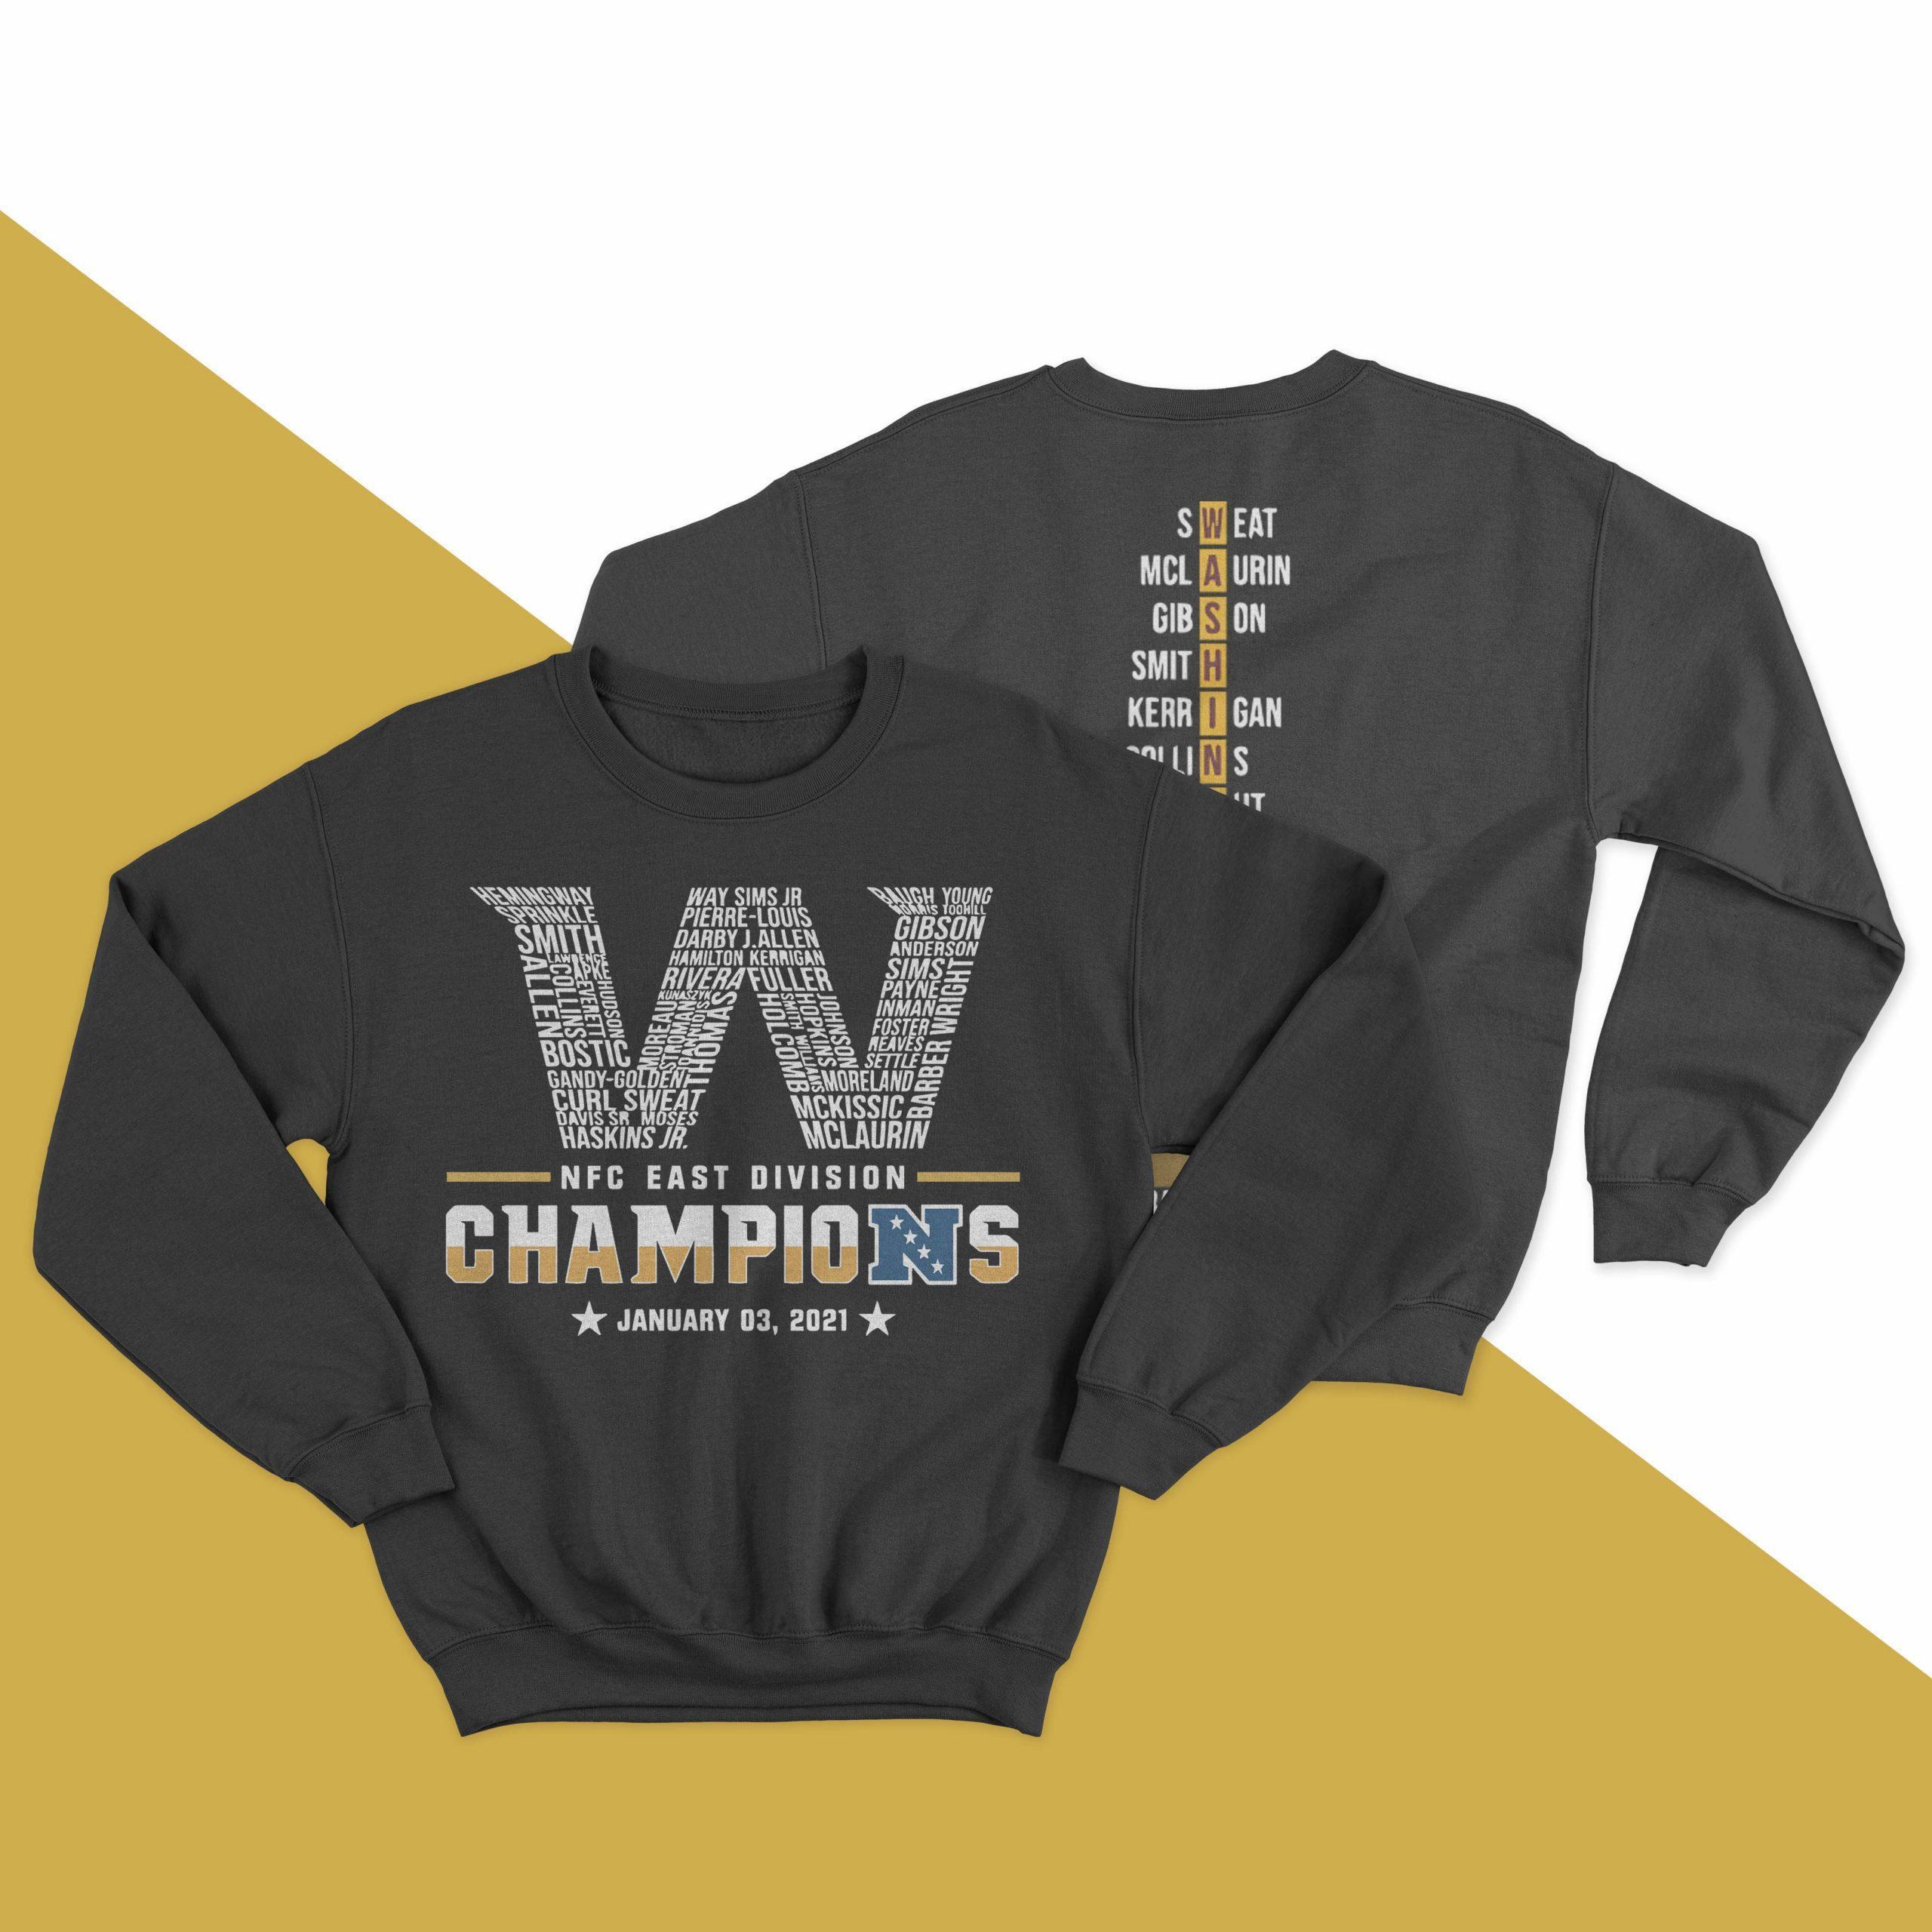 Washington Nfc East Division Champions January 03 2021 Tank Top